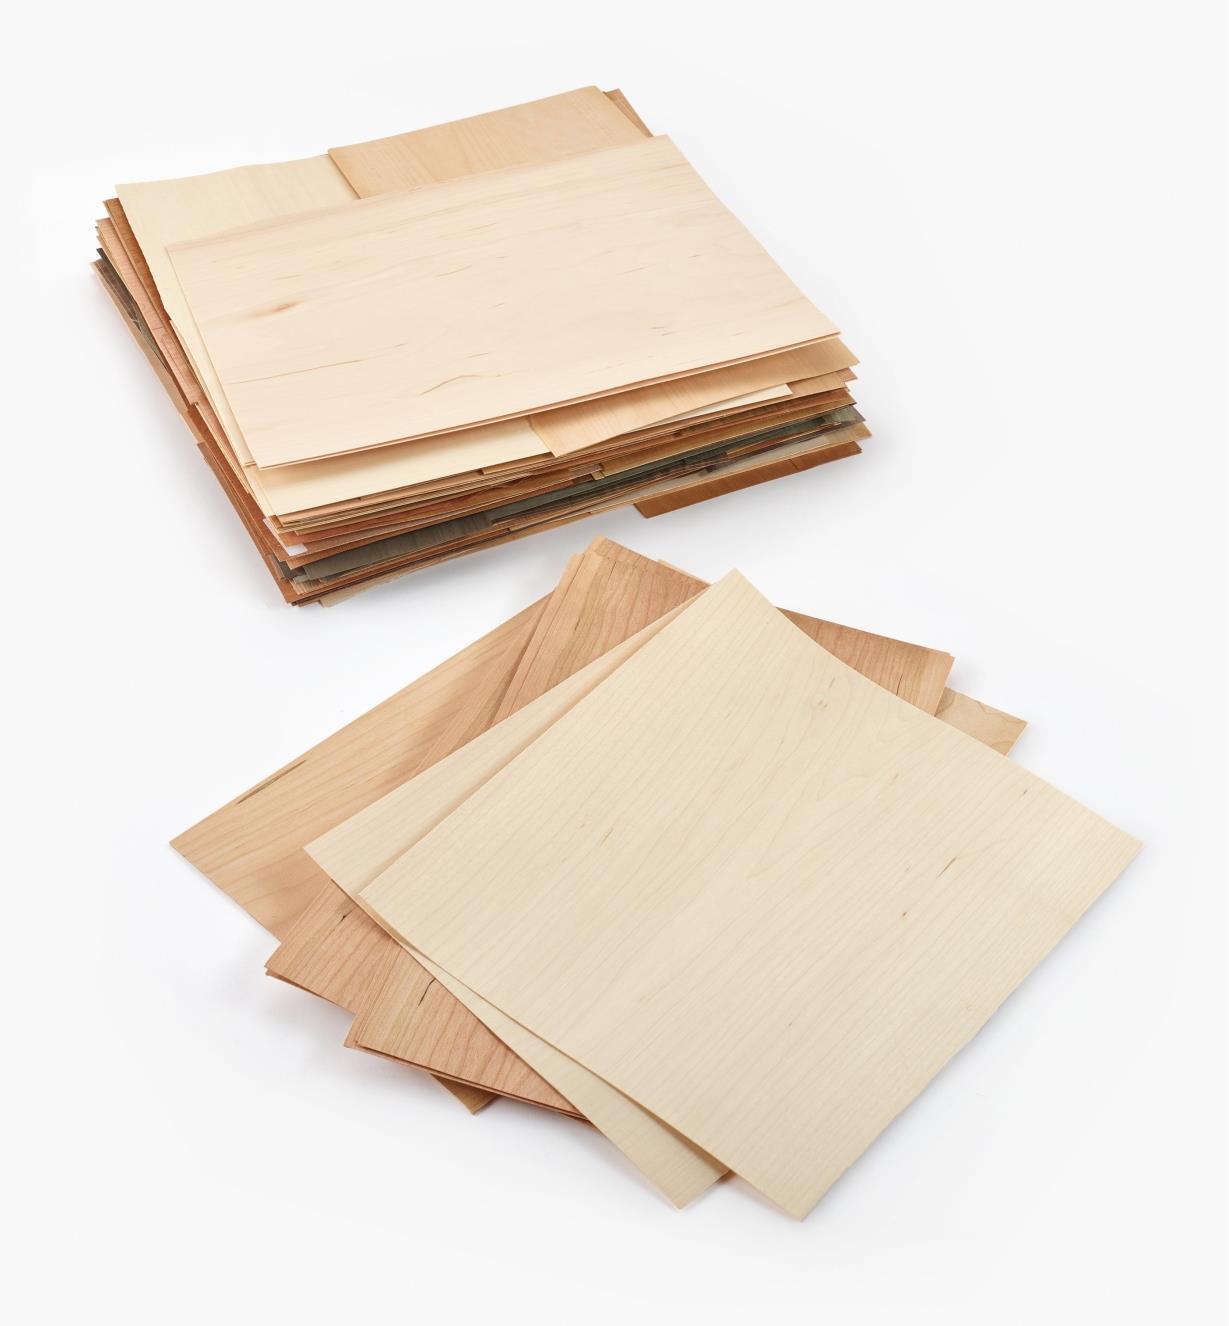 55K6601 - Boîte de bois de placage